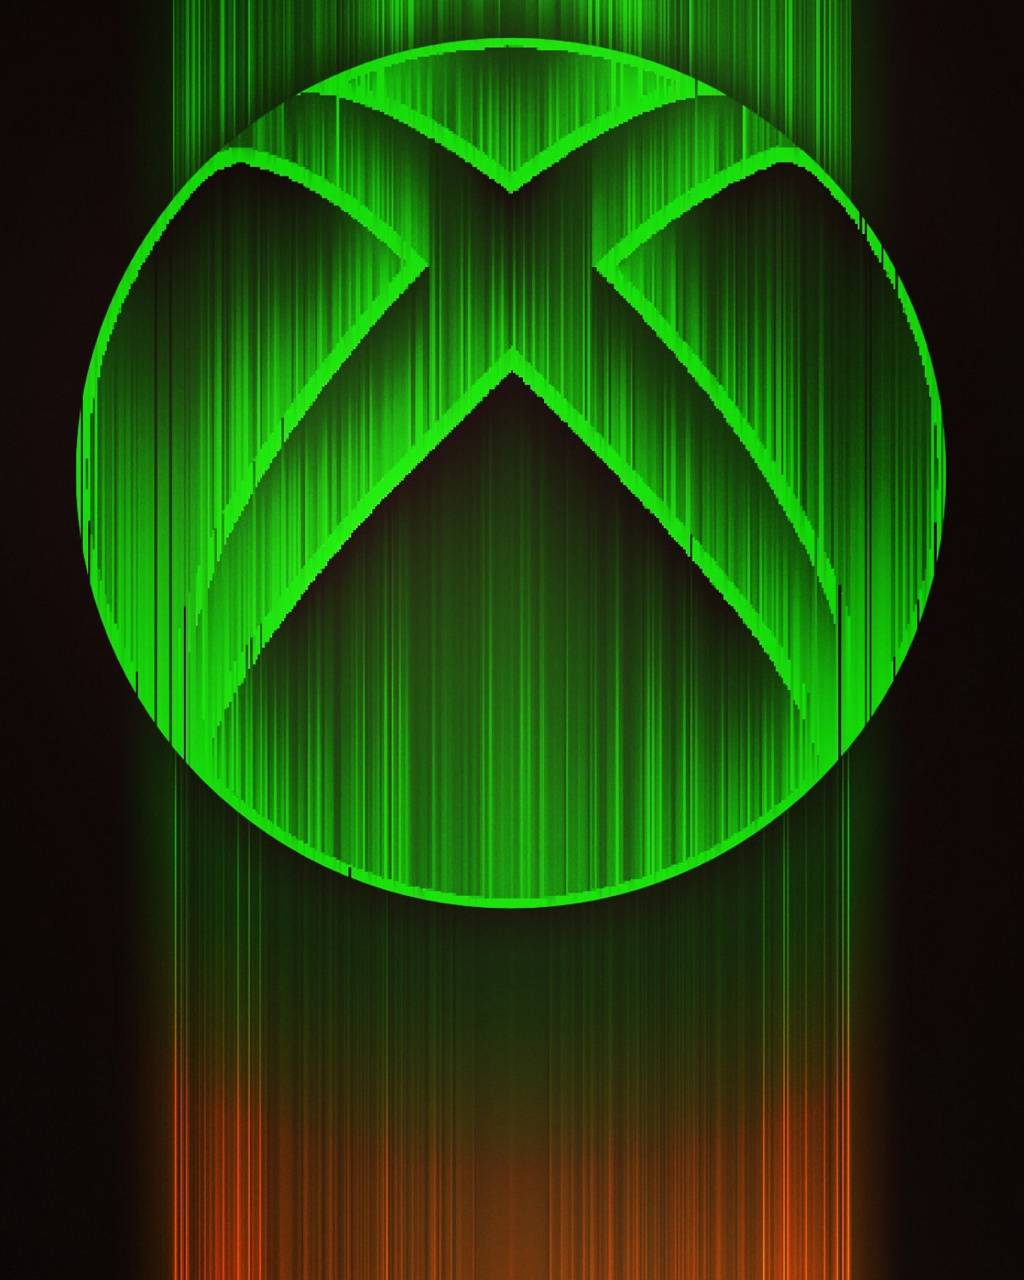 Xbox Logo Wallpaper By Ridge717 41 Free On Zedge